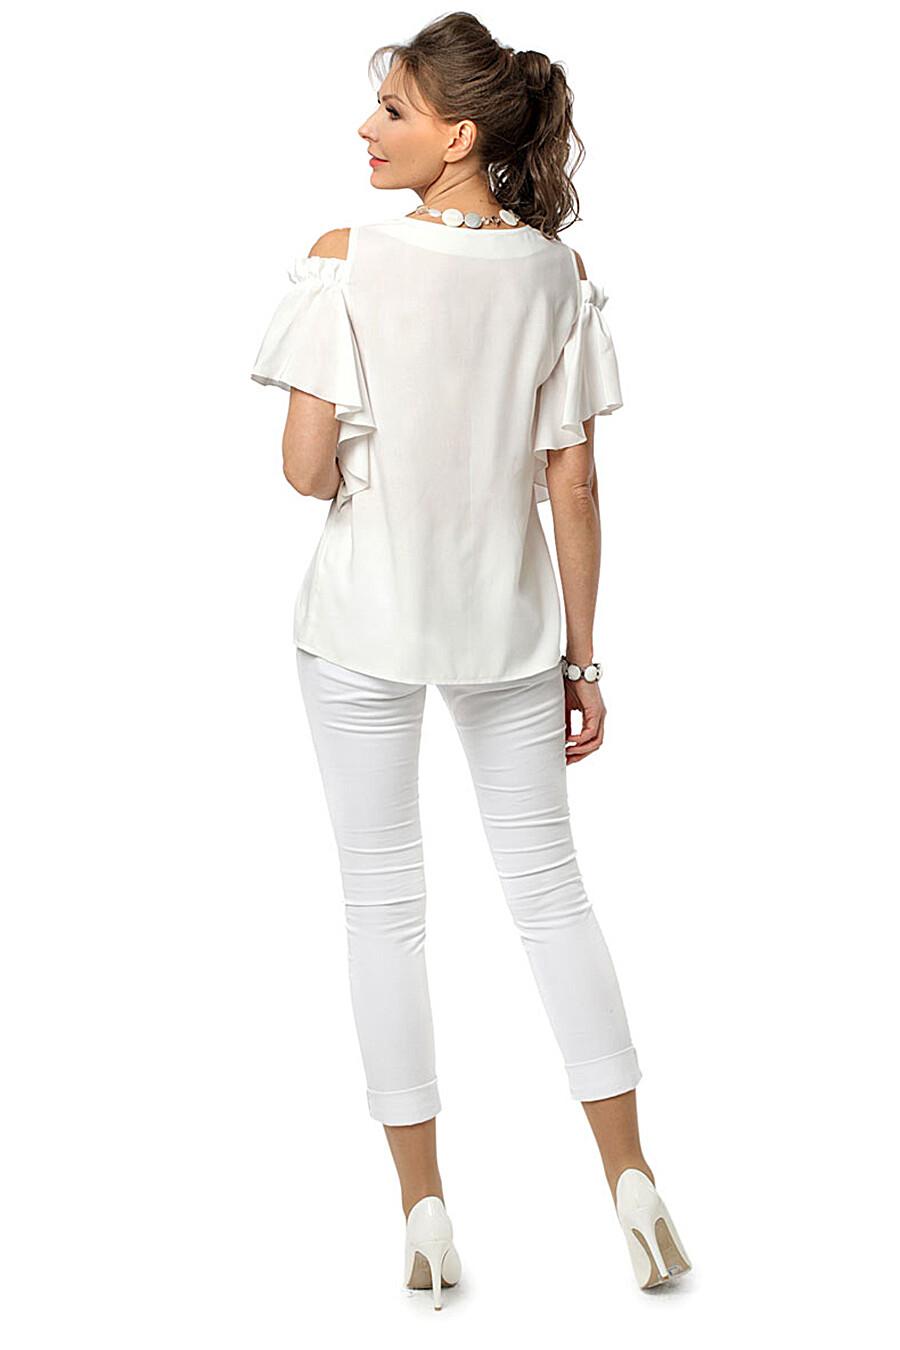 Блуза DIZZYWAY (115520), купить в Moyo.moda